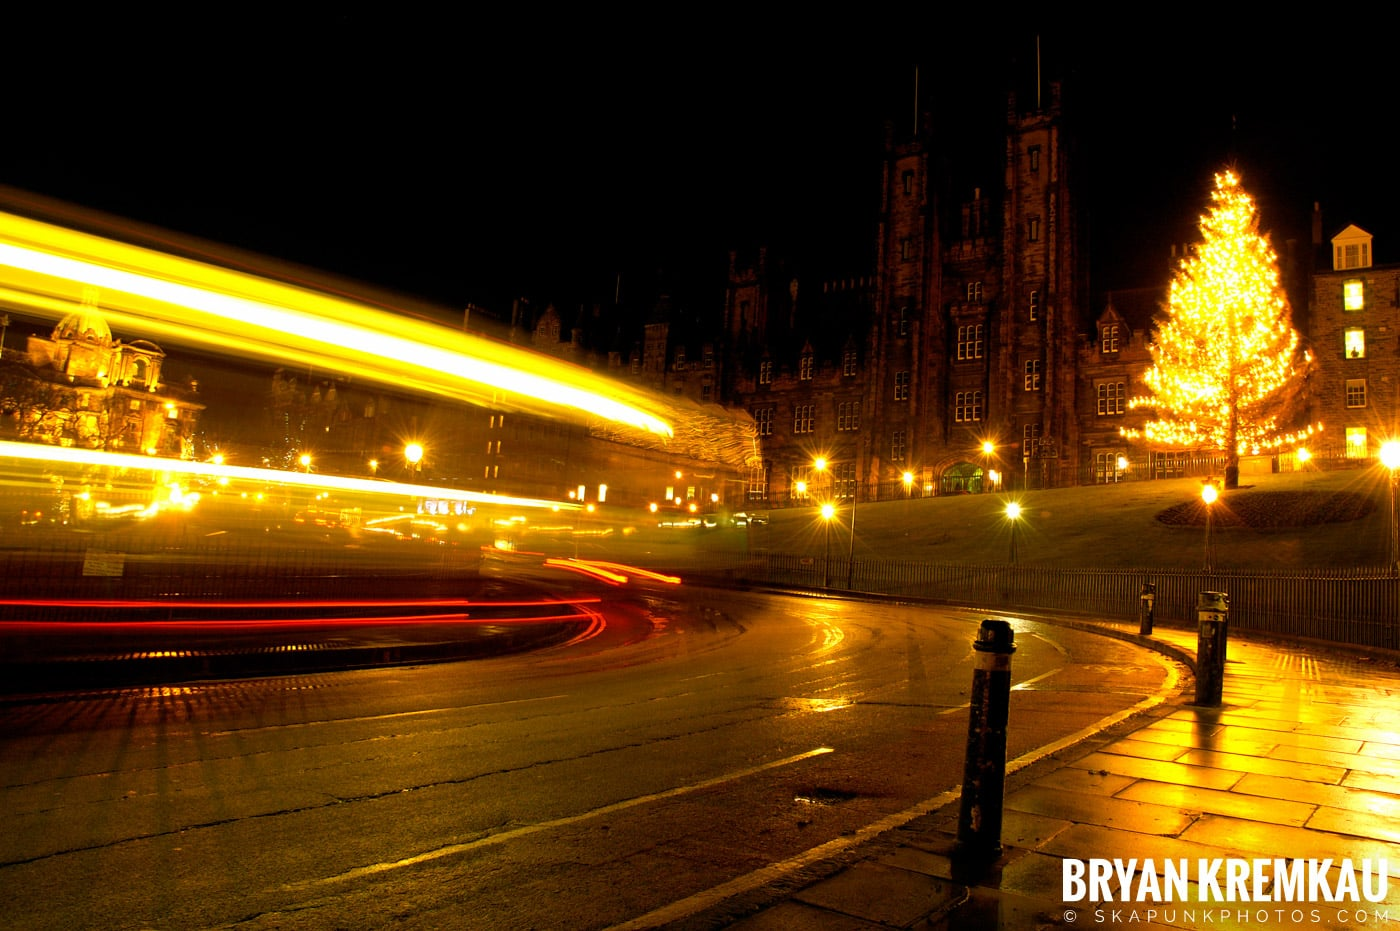 Edinburgh, Scotland - Day 1 - 12.12.06 (11)